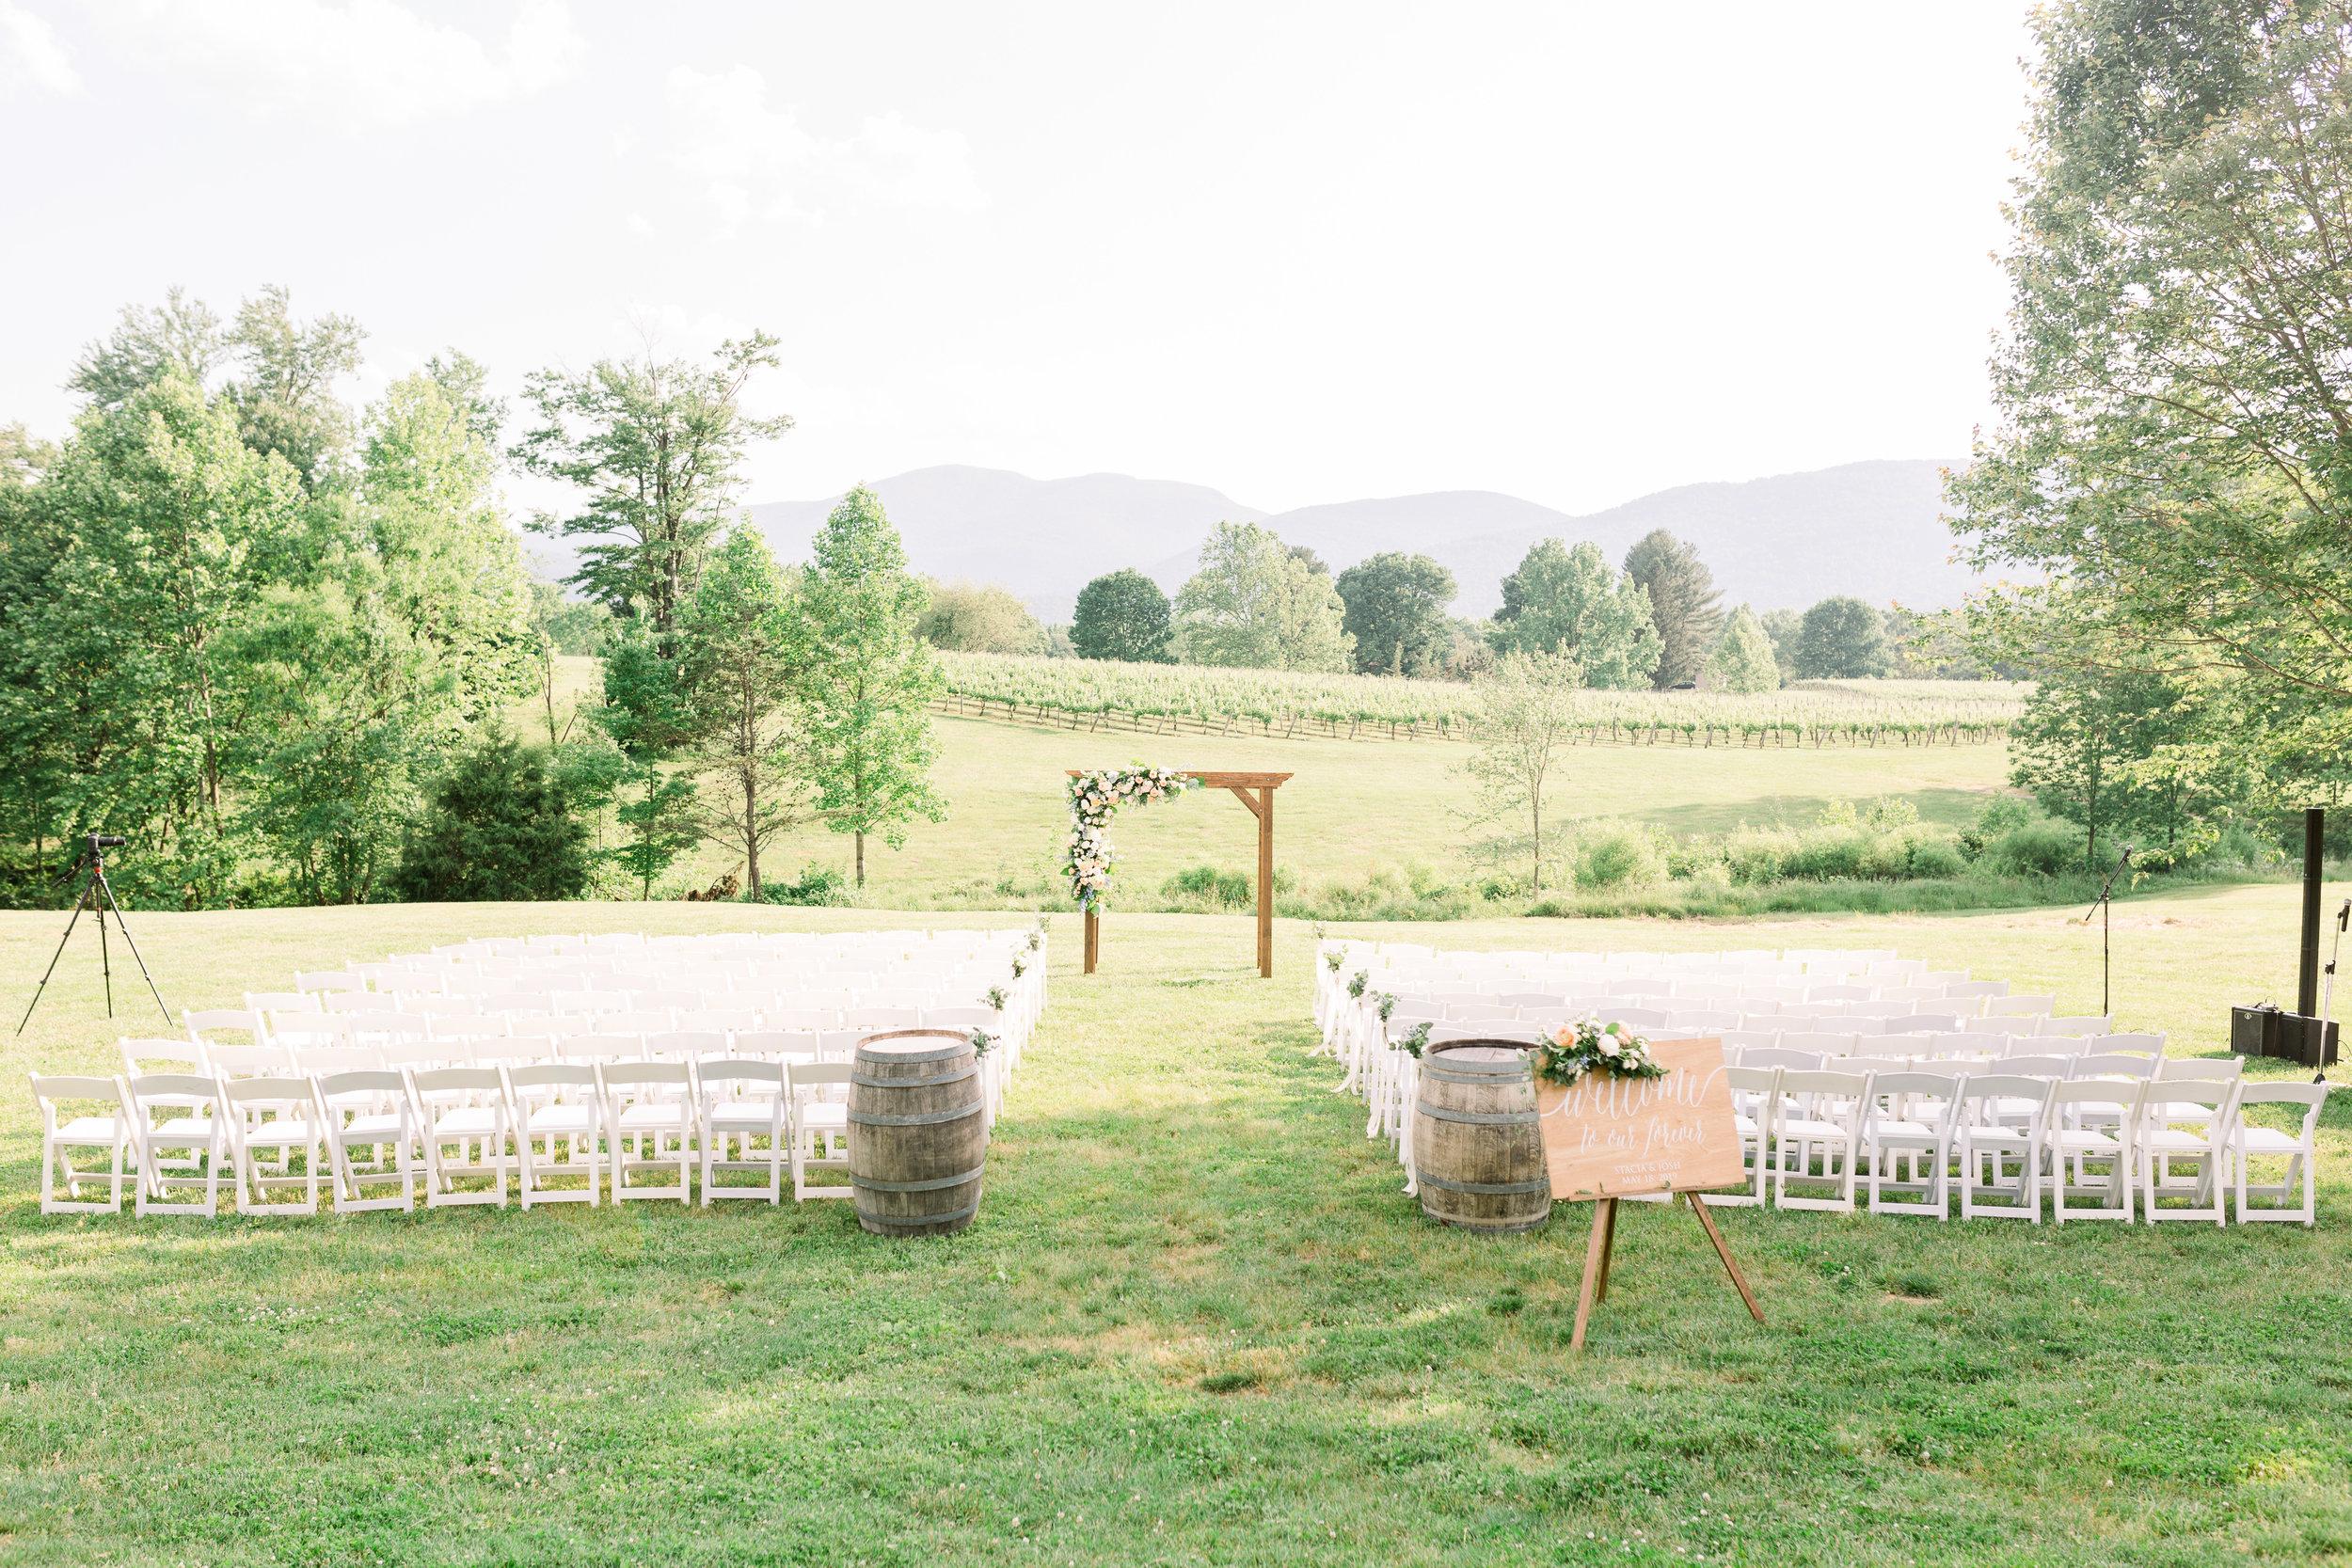 Courtney Inghram Charlottesville Virginia Wedding Florist Veritas Vineyard and Winery Peach and Blue Spring Wedding